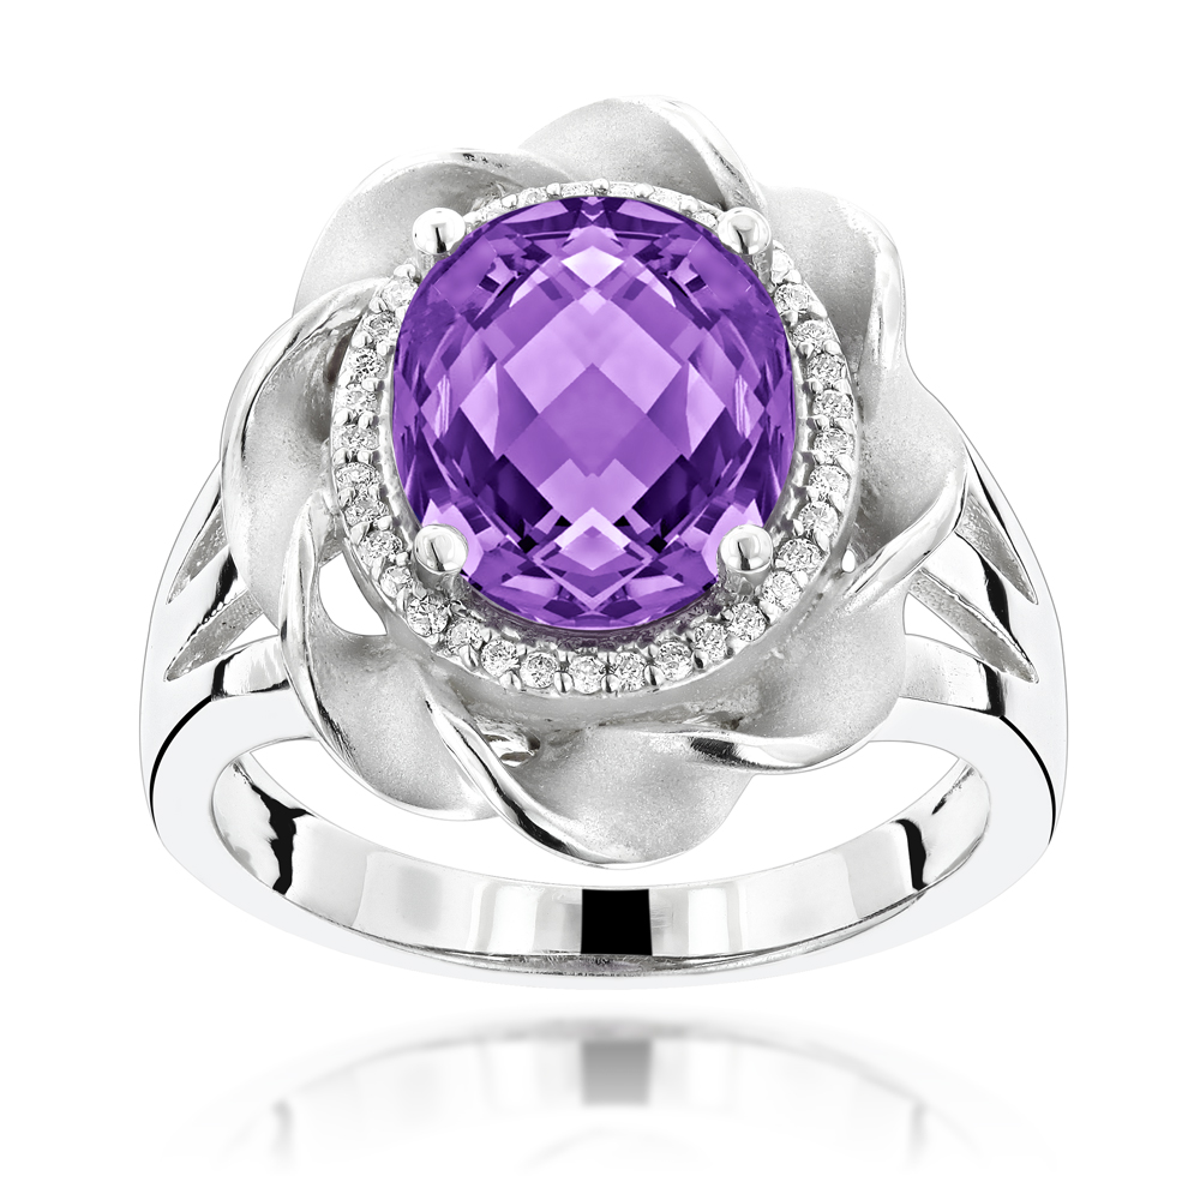 Gemstone Jewelry: Amethyst Diamond Flower Ring 0.13ct 14K Gold